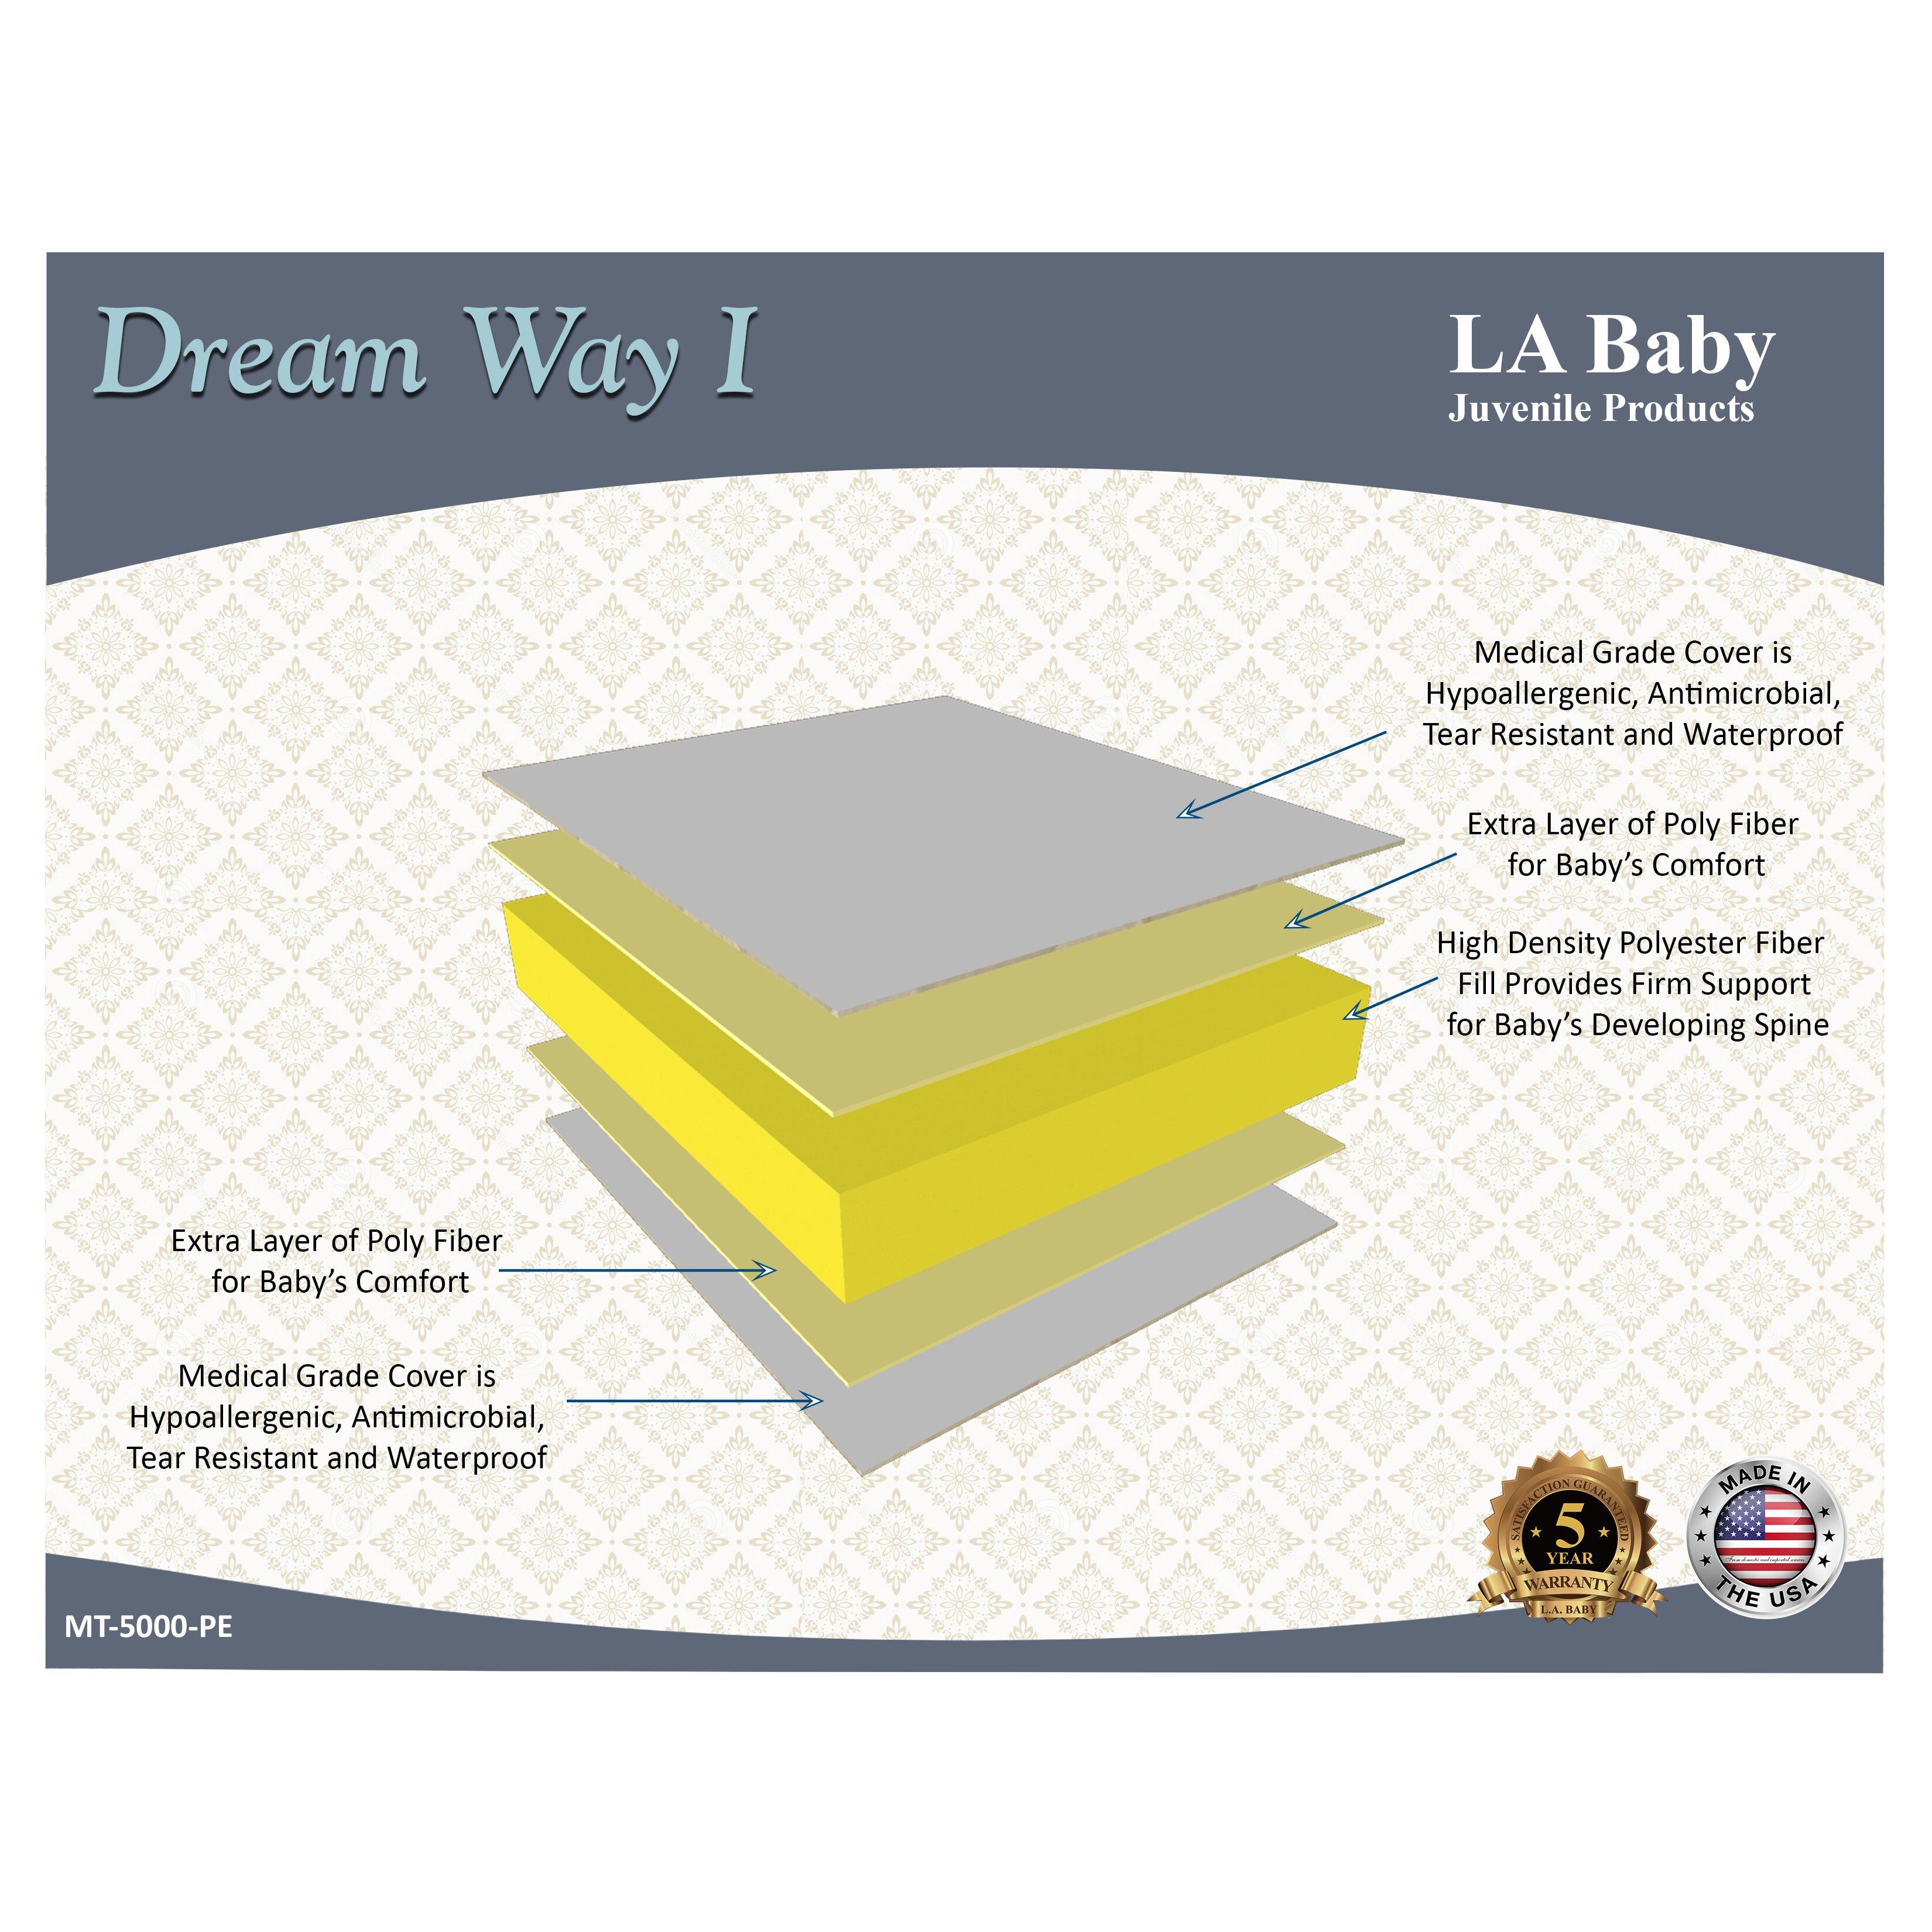 Baby crib mattress comparison - L A Baby Dream Way Crib Mattress